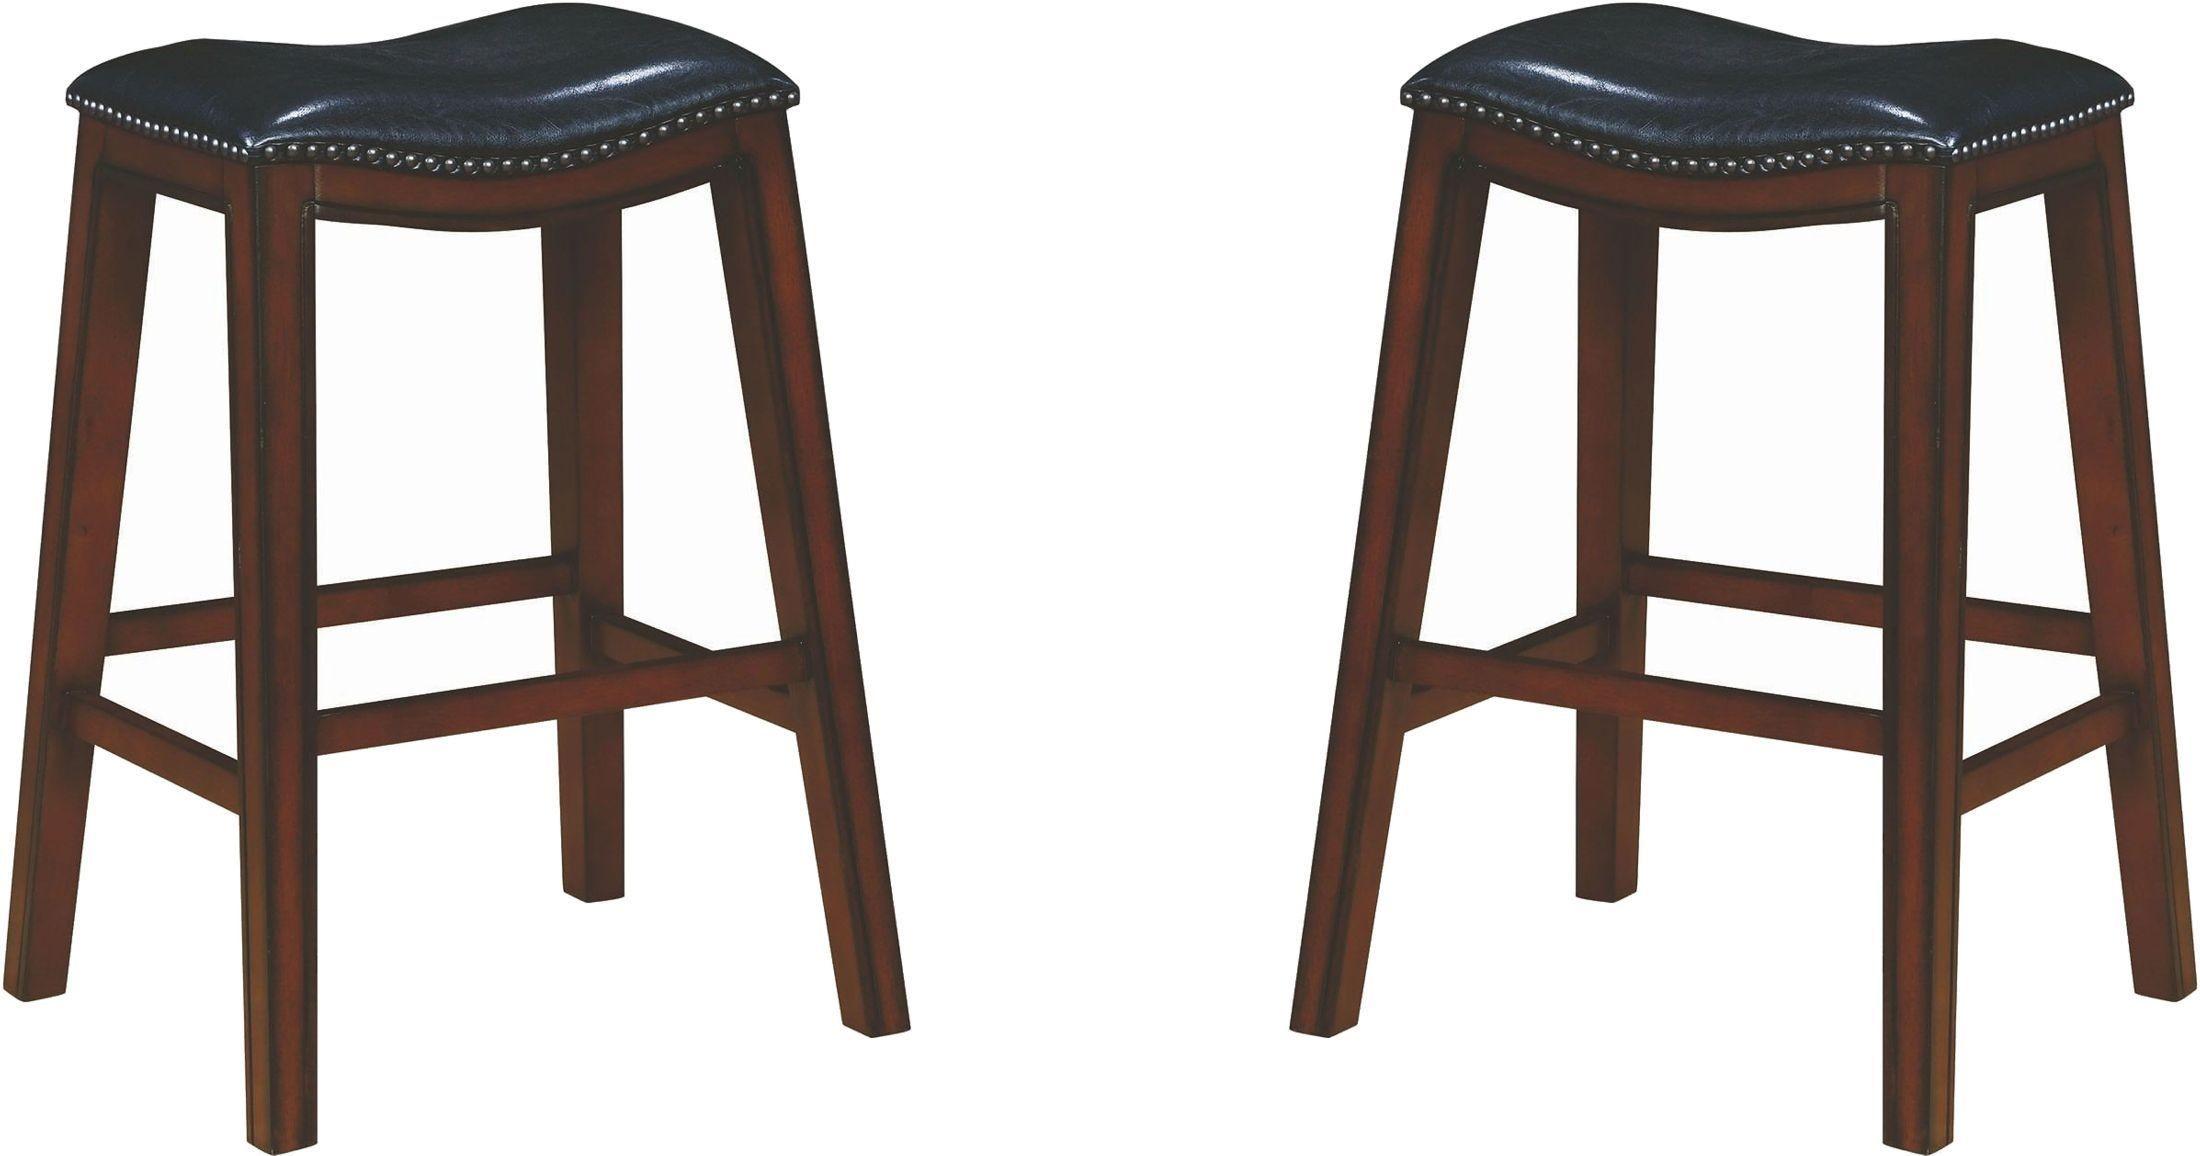 Rec Room Black Upholstered Bar Stool Set of 2 from Coaster | Coleman ...